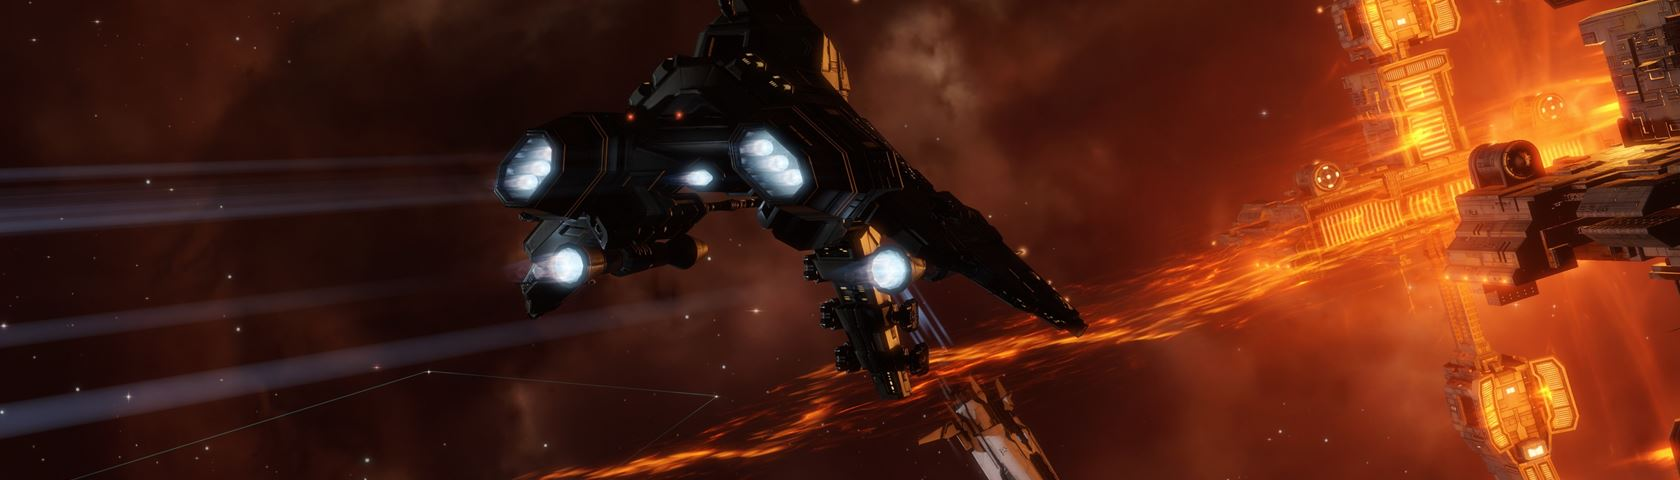 Eve Online - Hawk